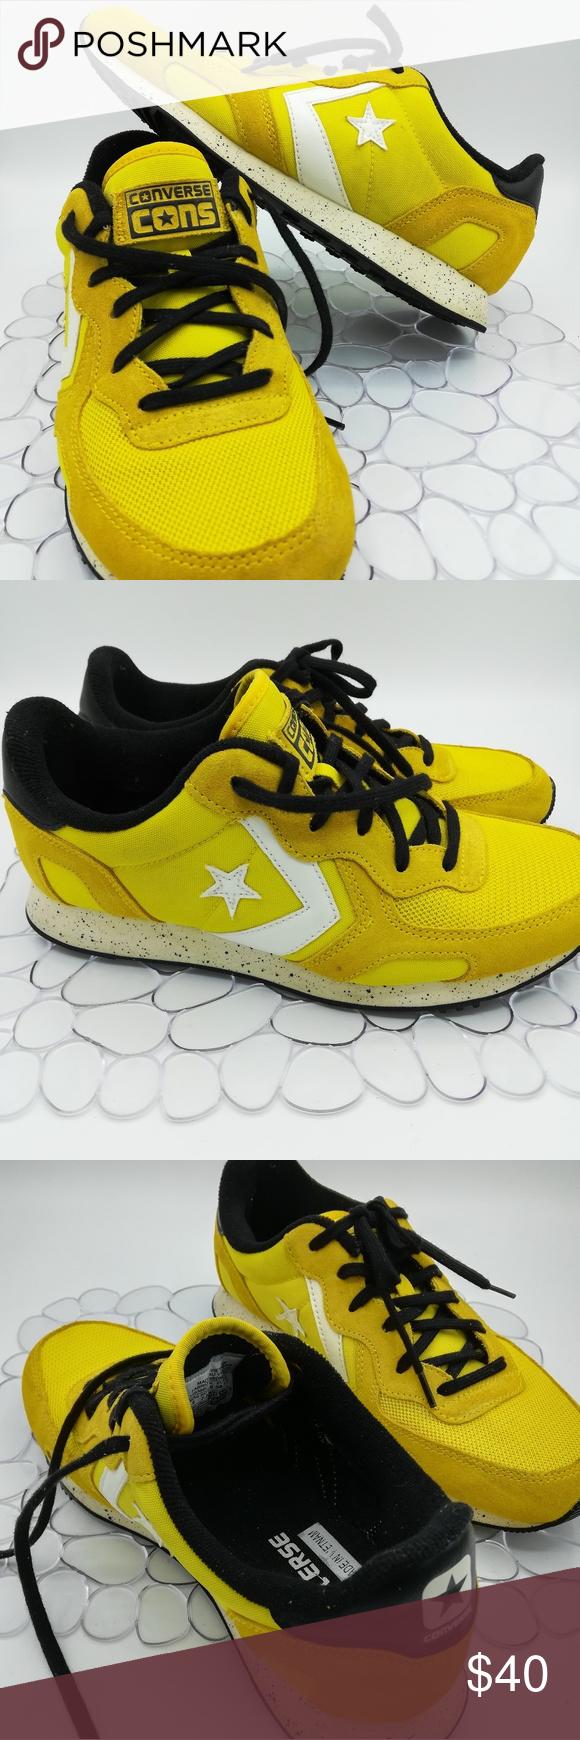 Converse Cons rare yellow and black